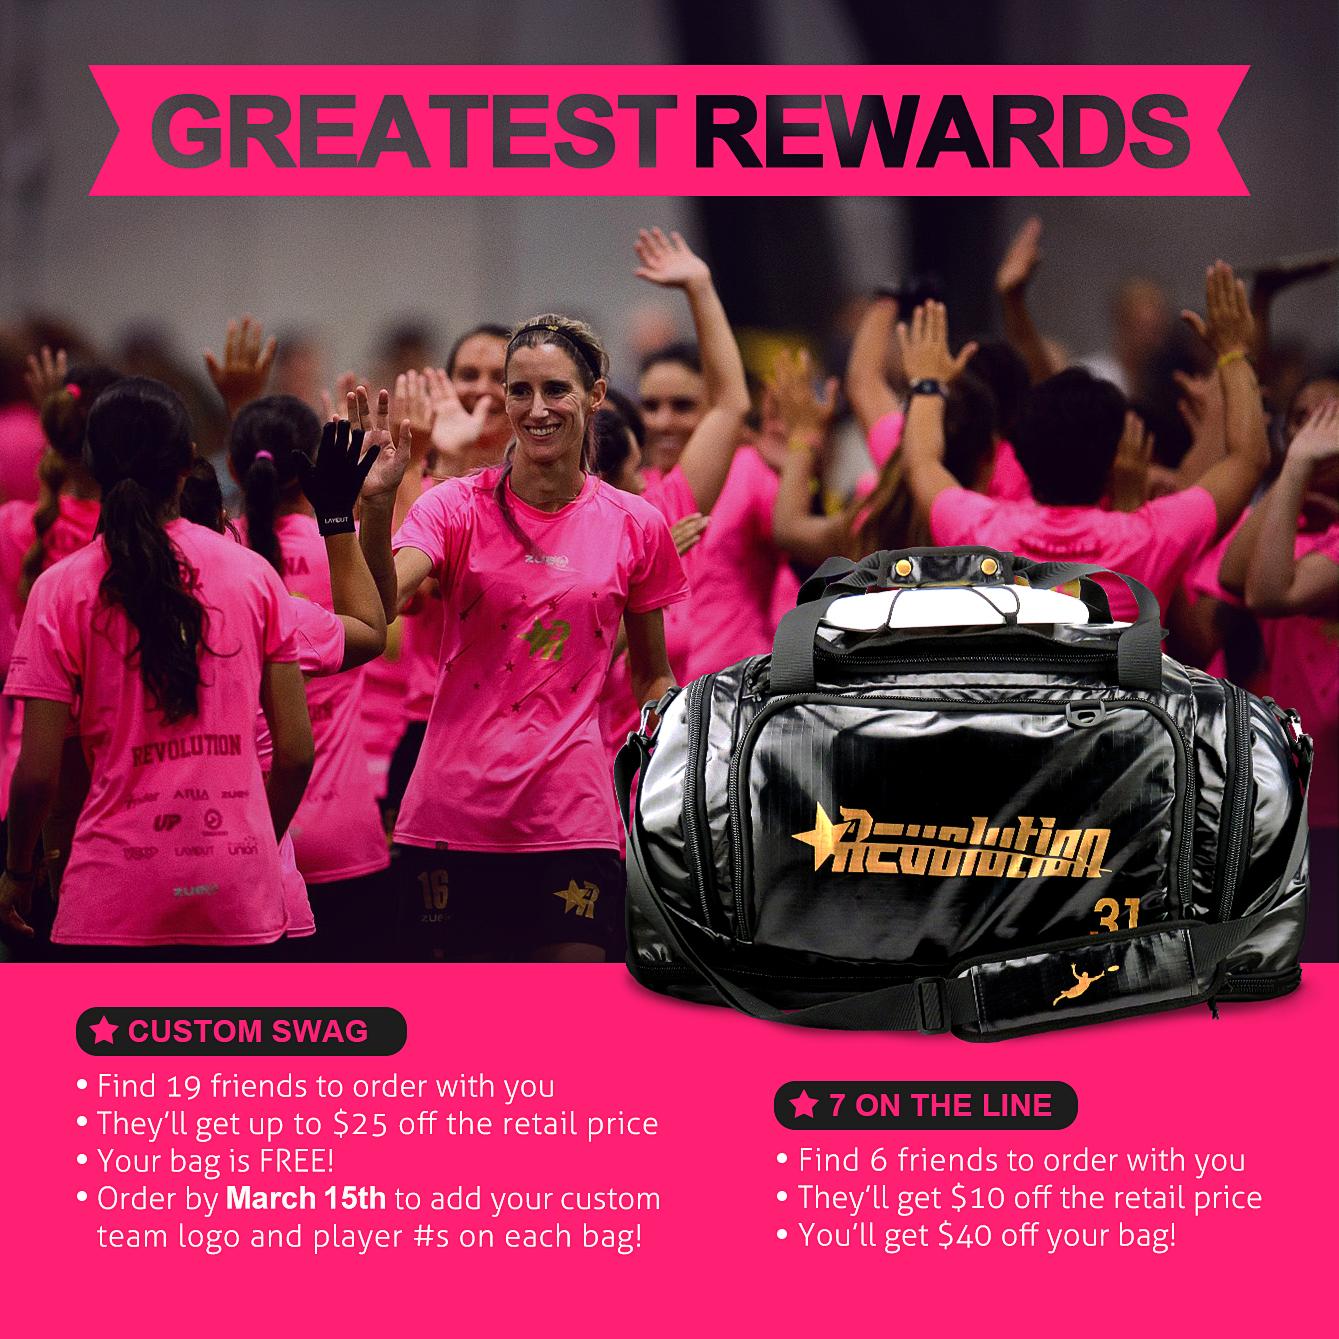 greatest rewards.jpg